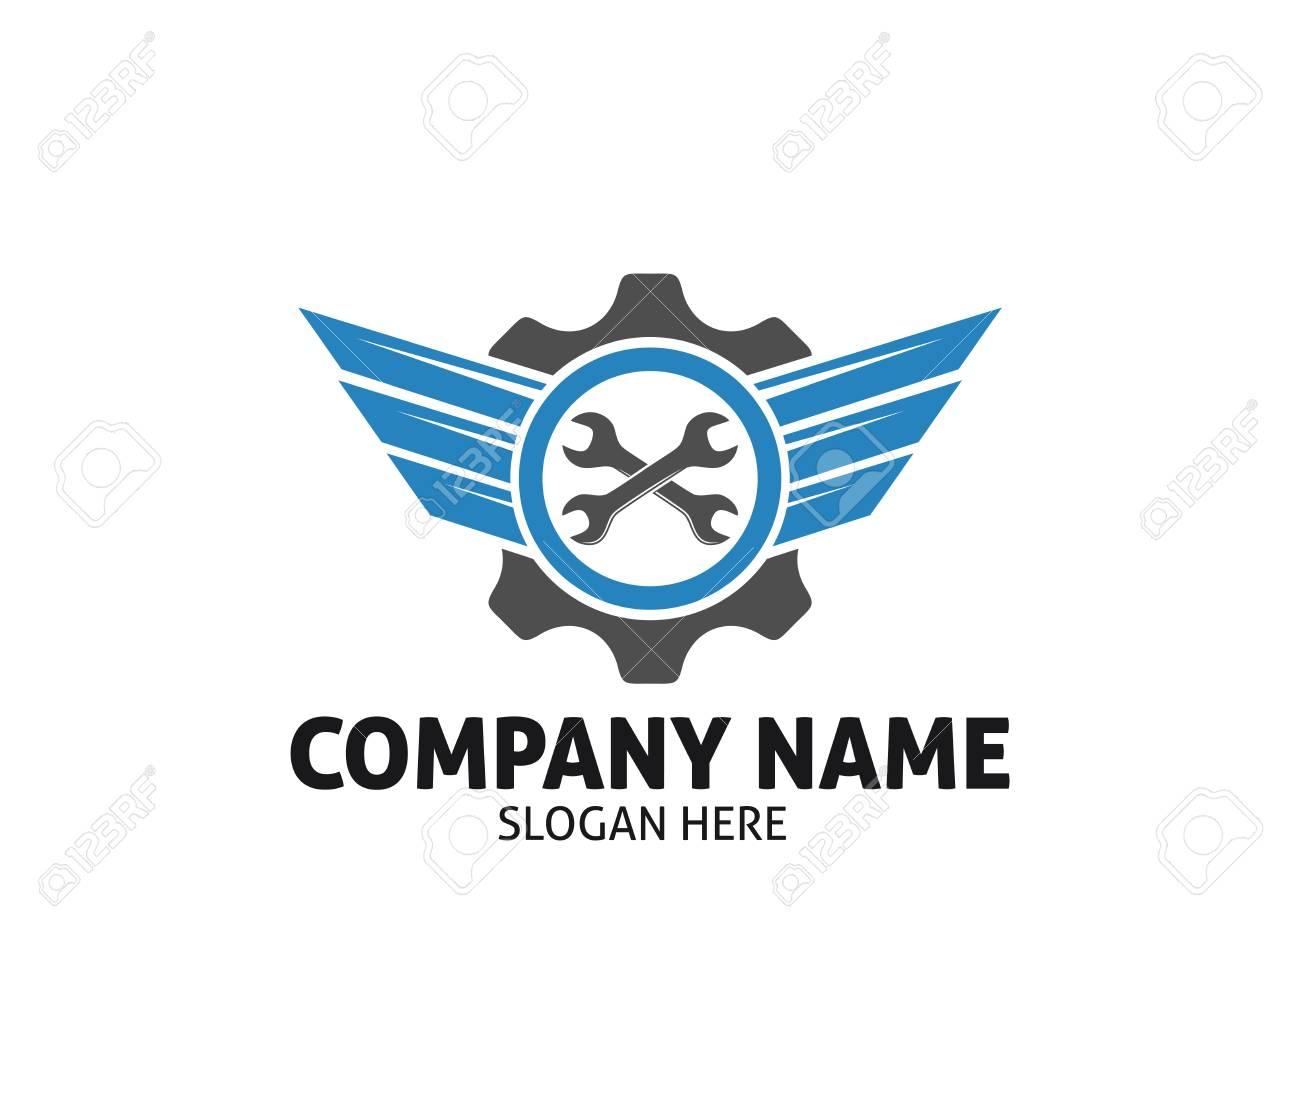 Car Auto Care Dealer Repair Service Vector Logo Design Template